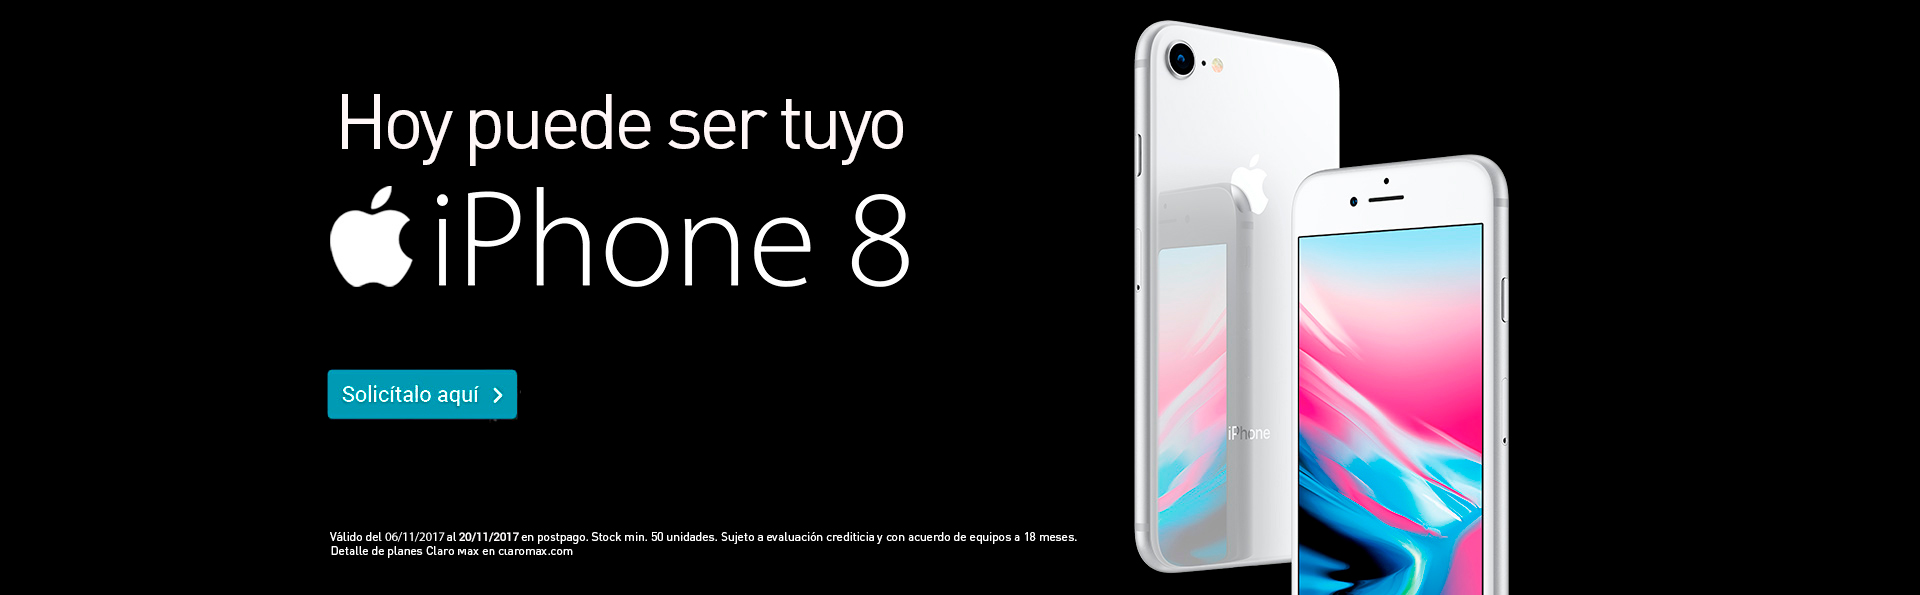 nuevo-iphone8